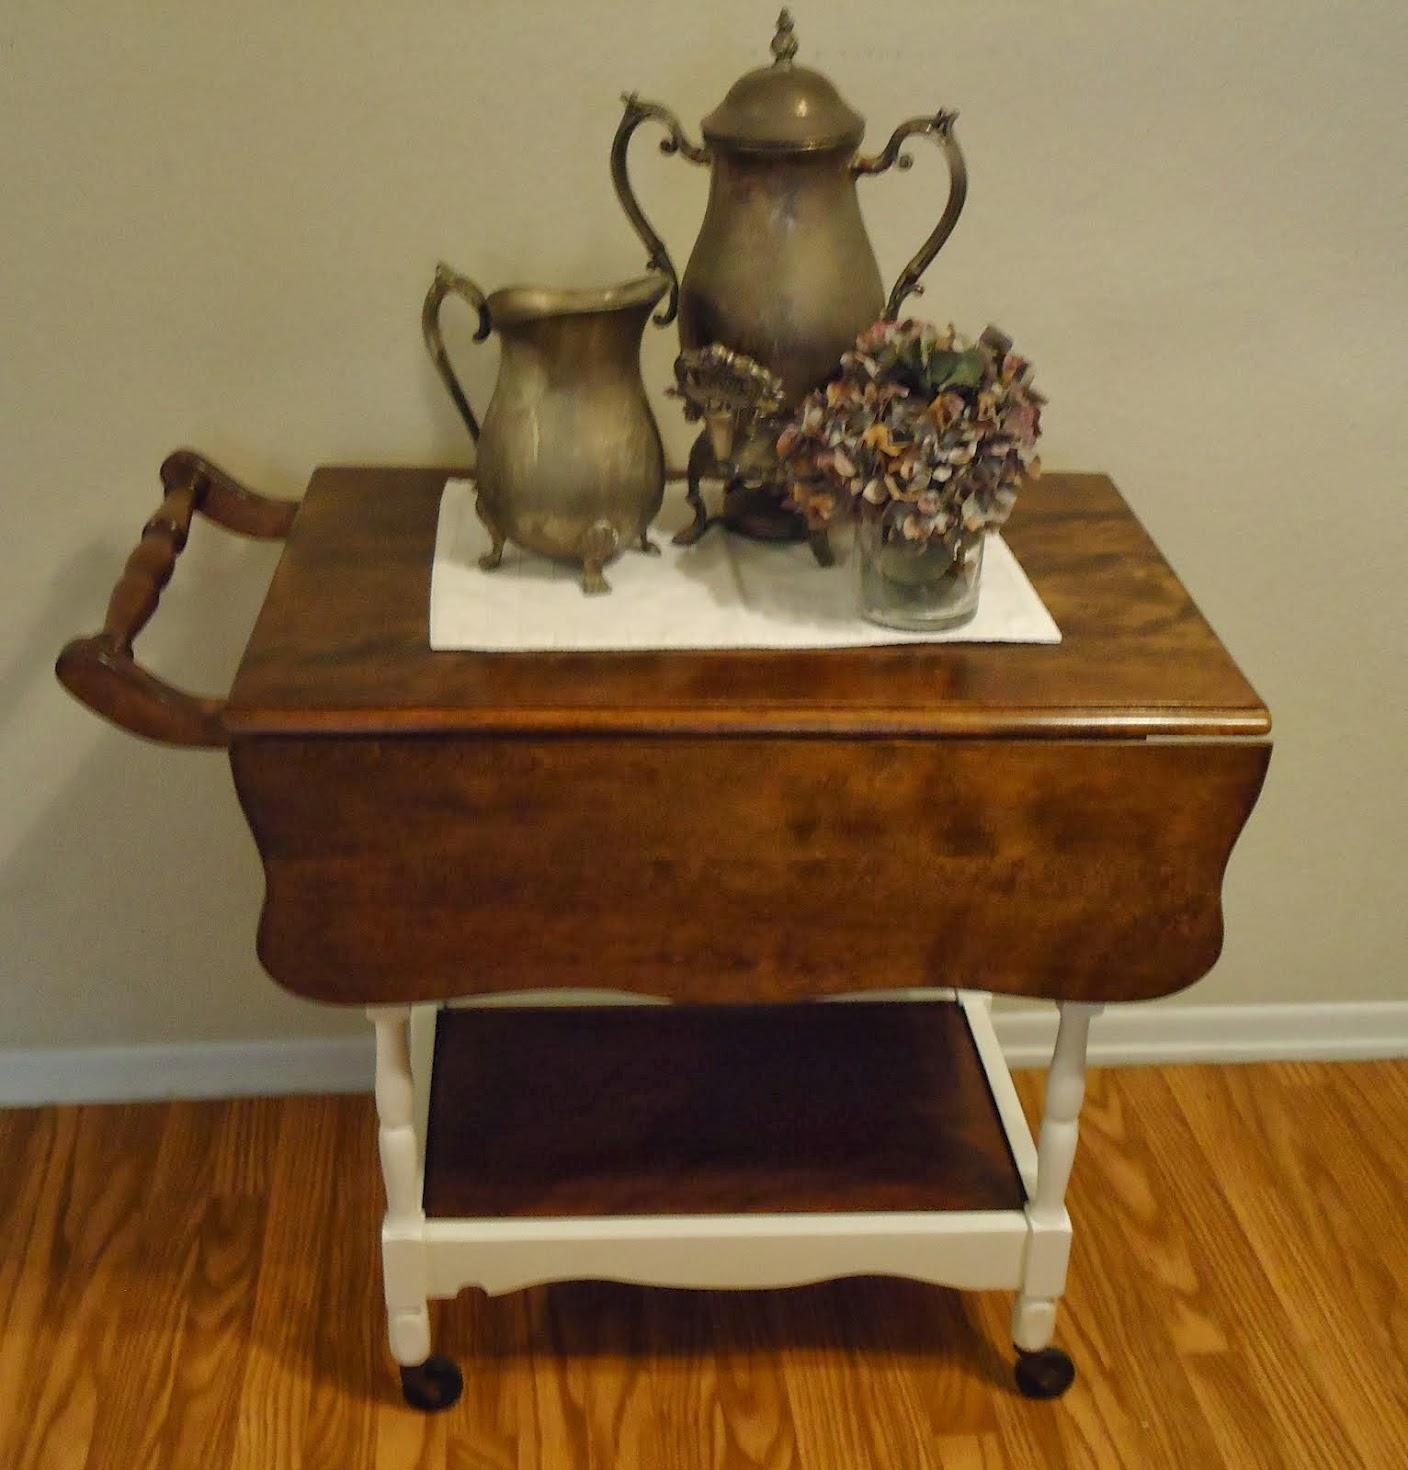 Vintage Drop Leaf Tea Cart with Detachable Serving Tray - SOLD